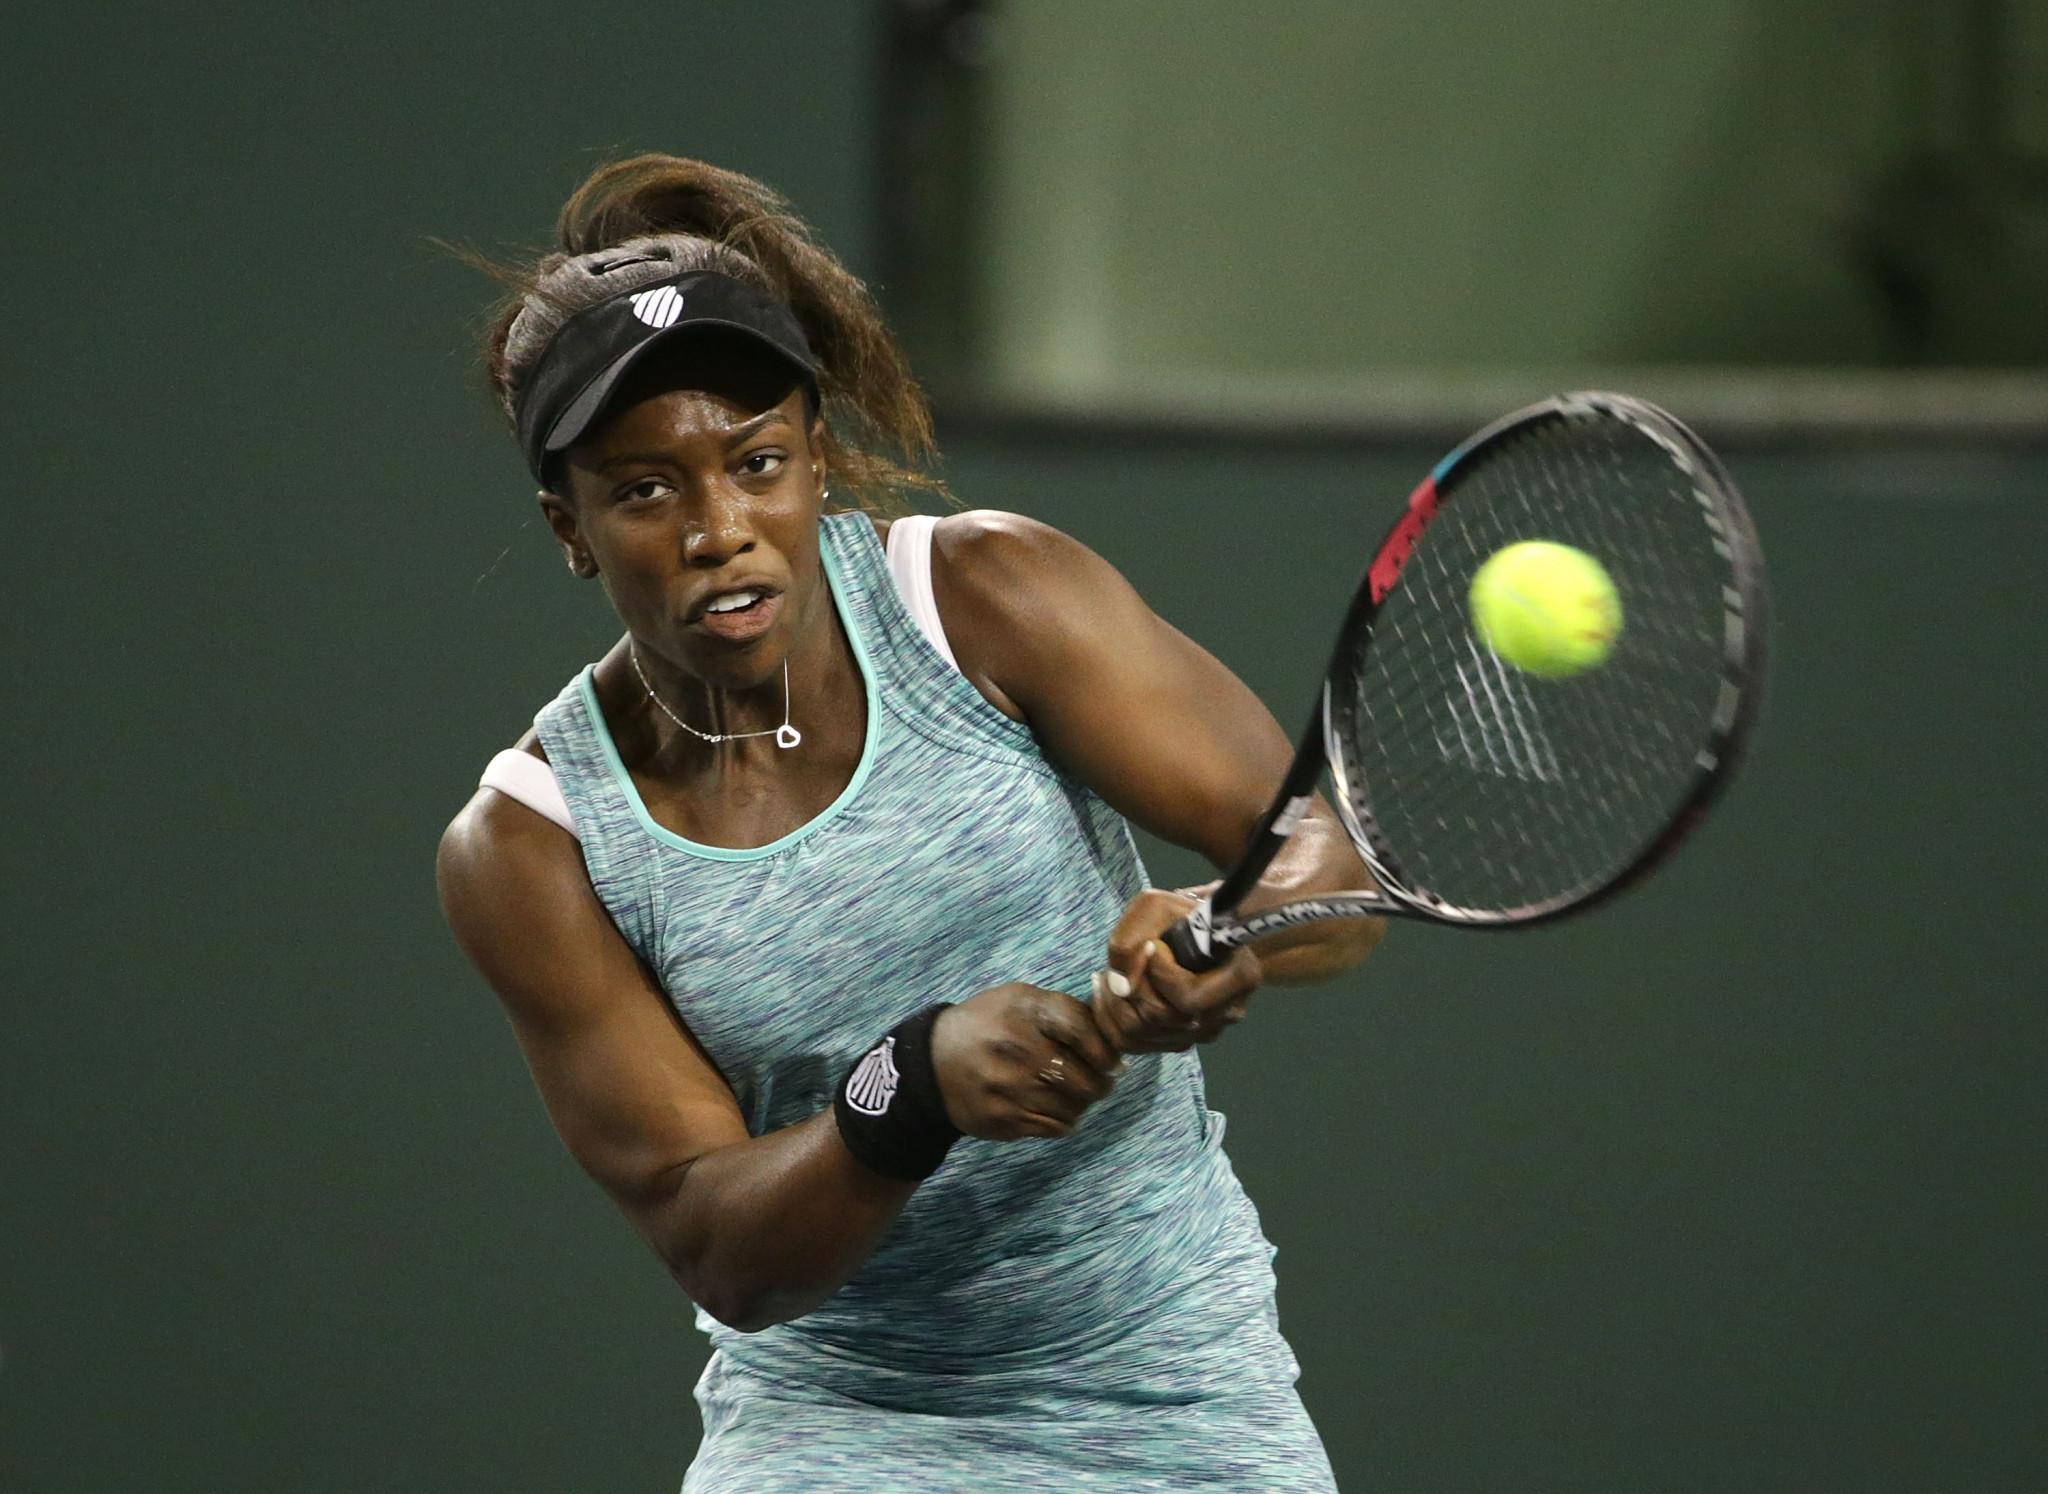 Vickery fights back to stun Muguruza at Indian Wells Masters